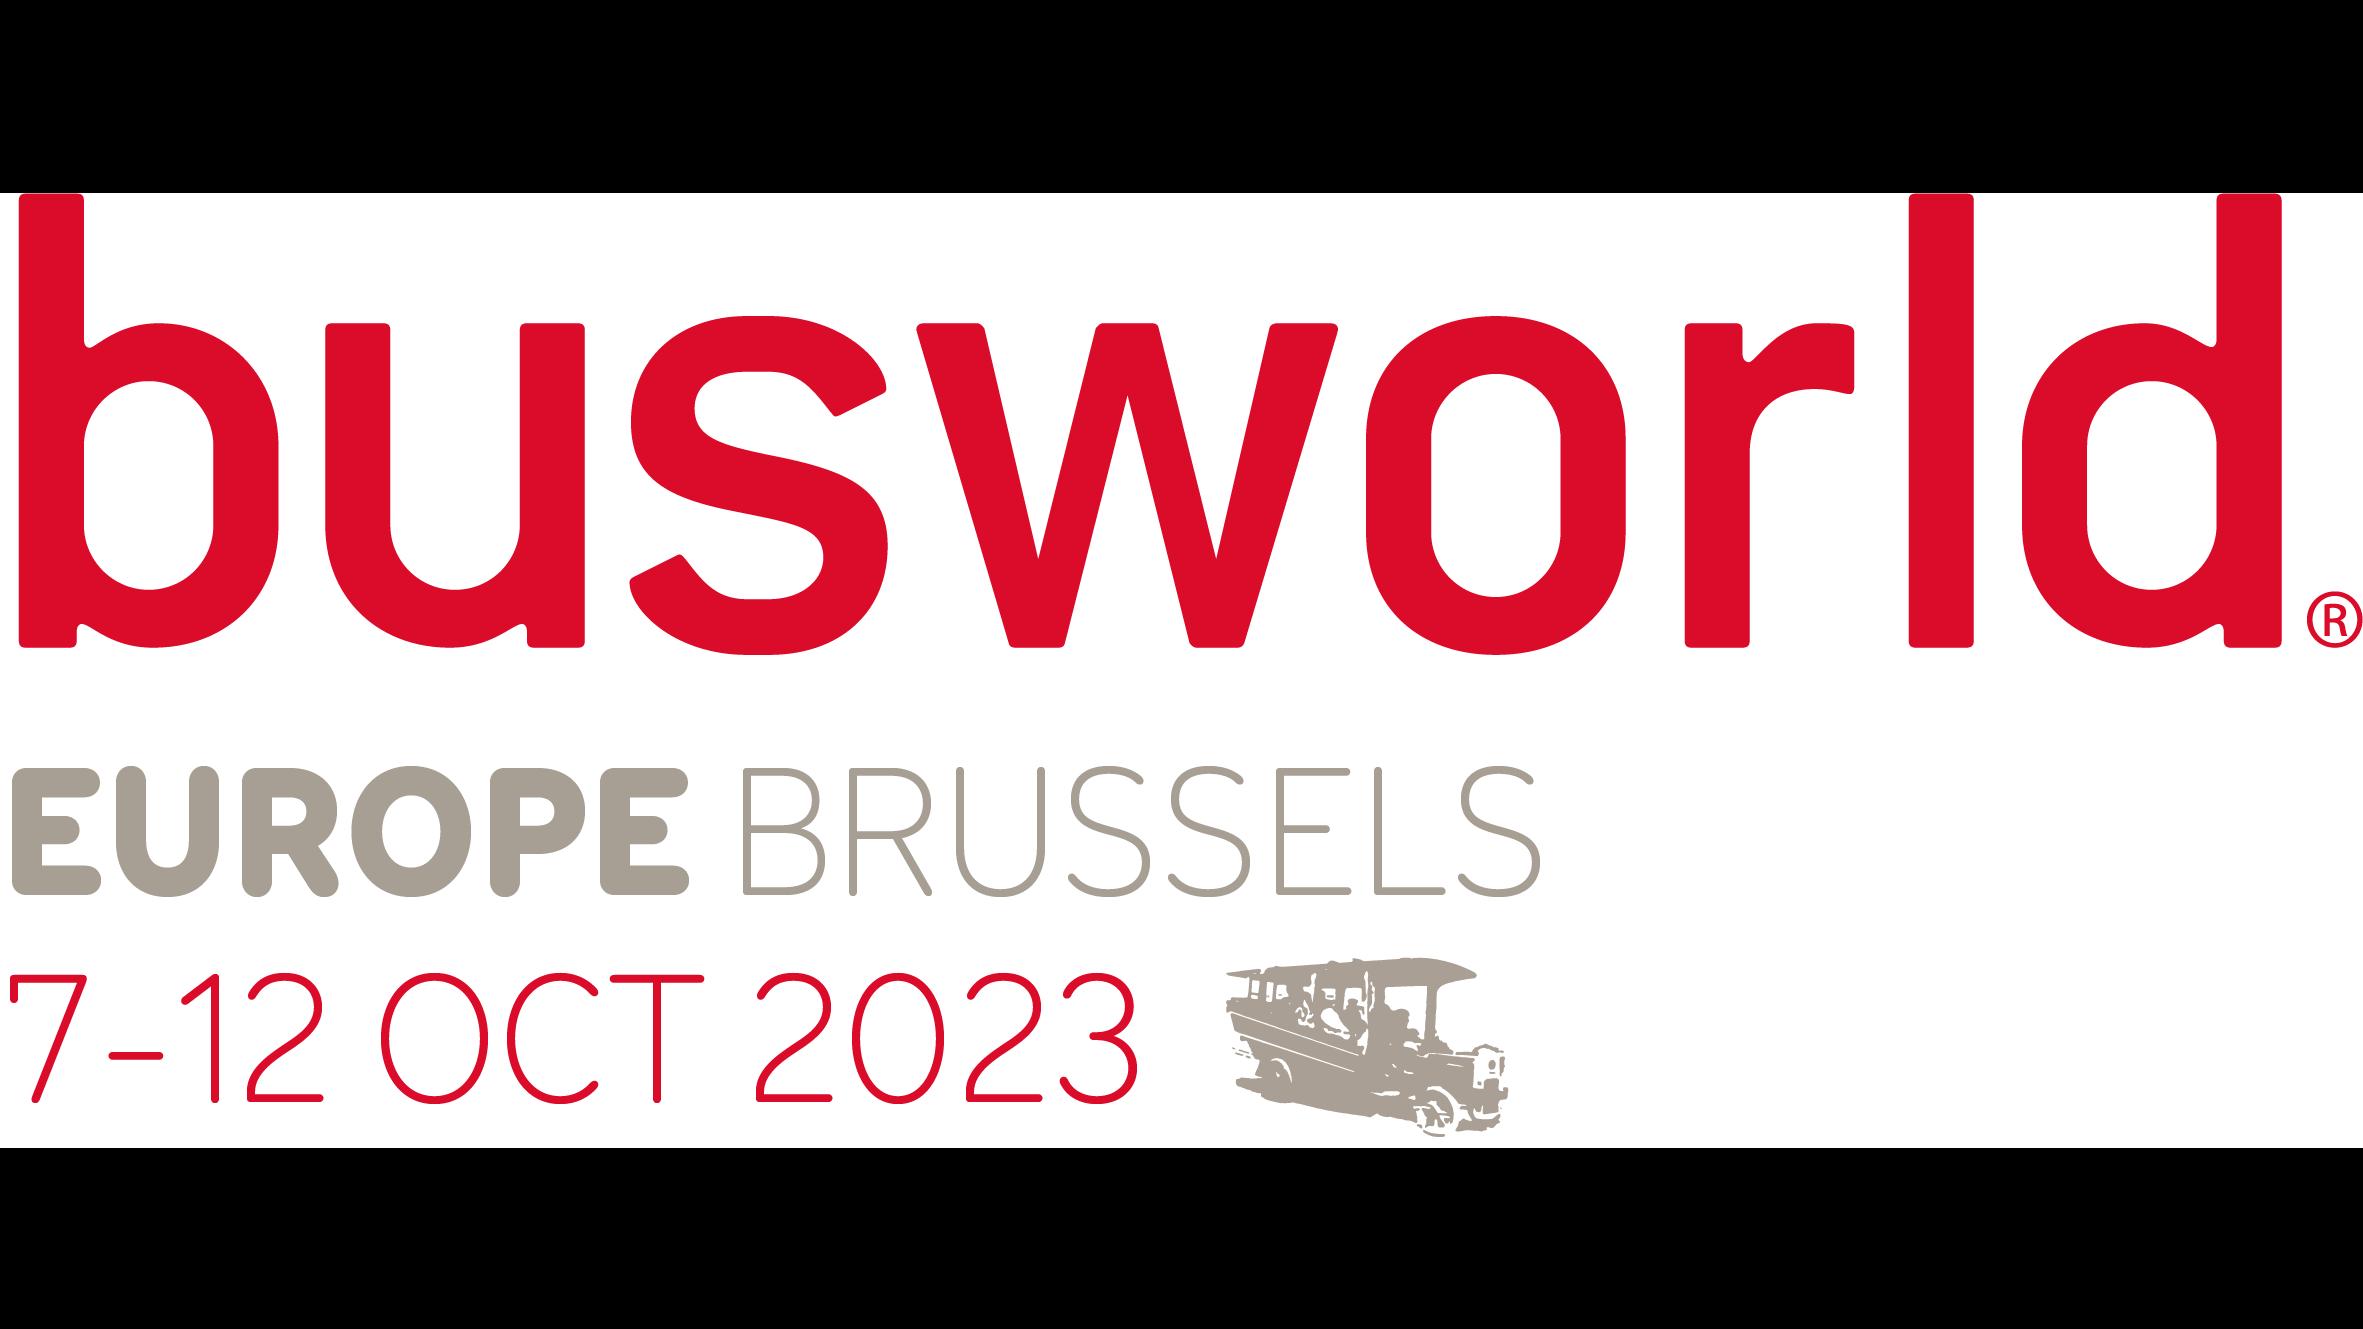 Busworld Europe 2023